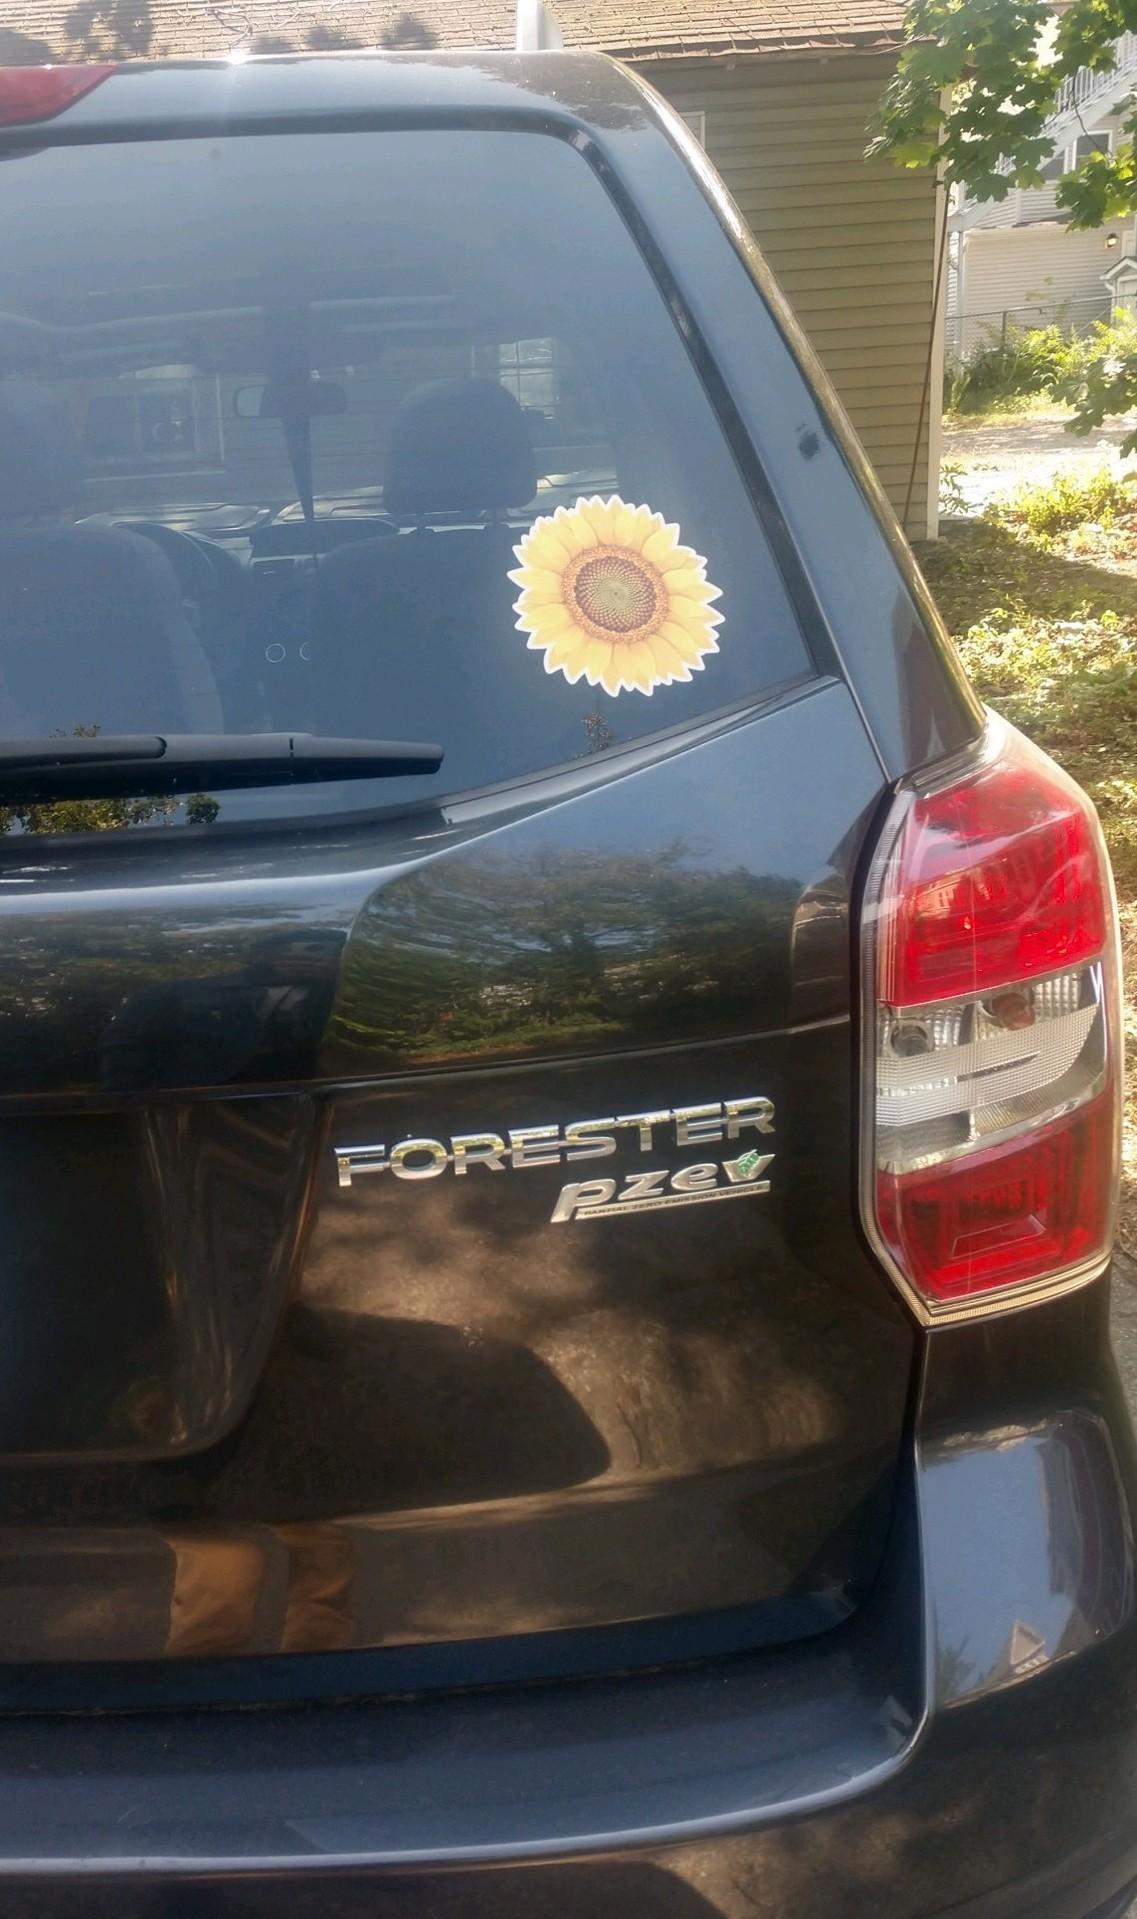 Luke's photograph of their Realistic Sunflower Sticker